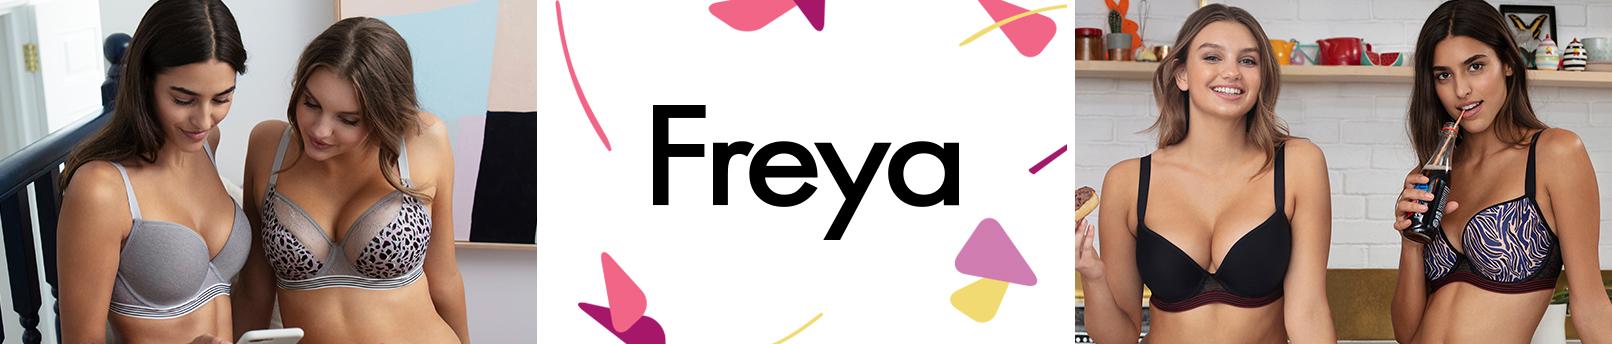 Shop Freya